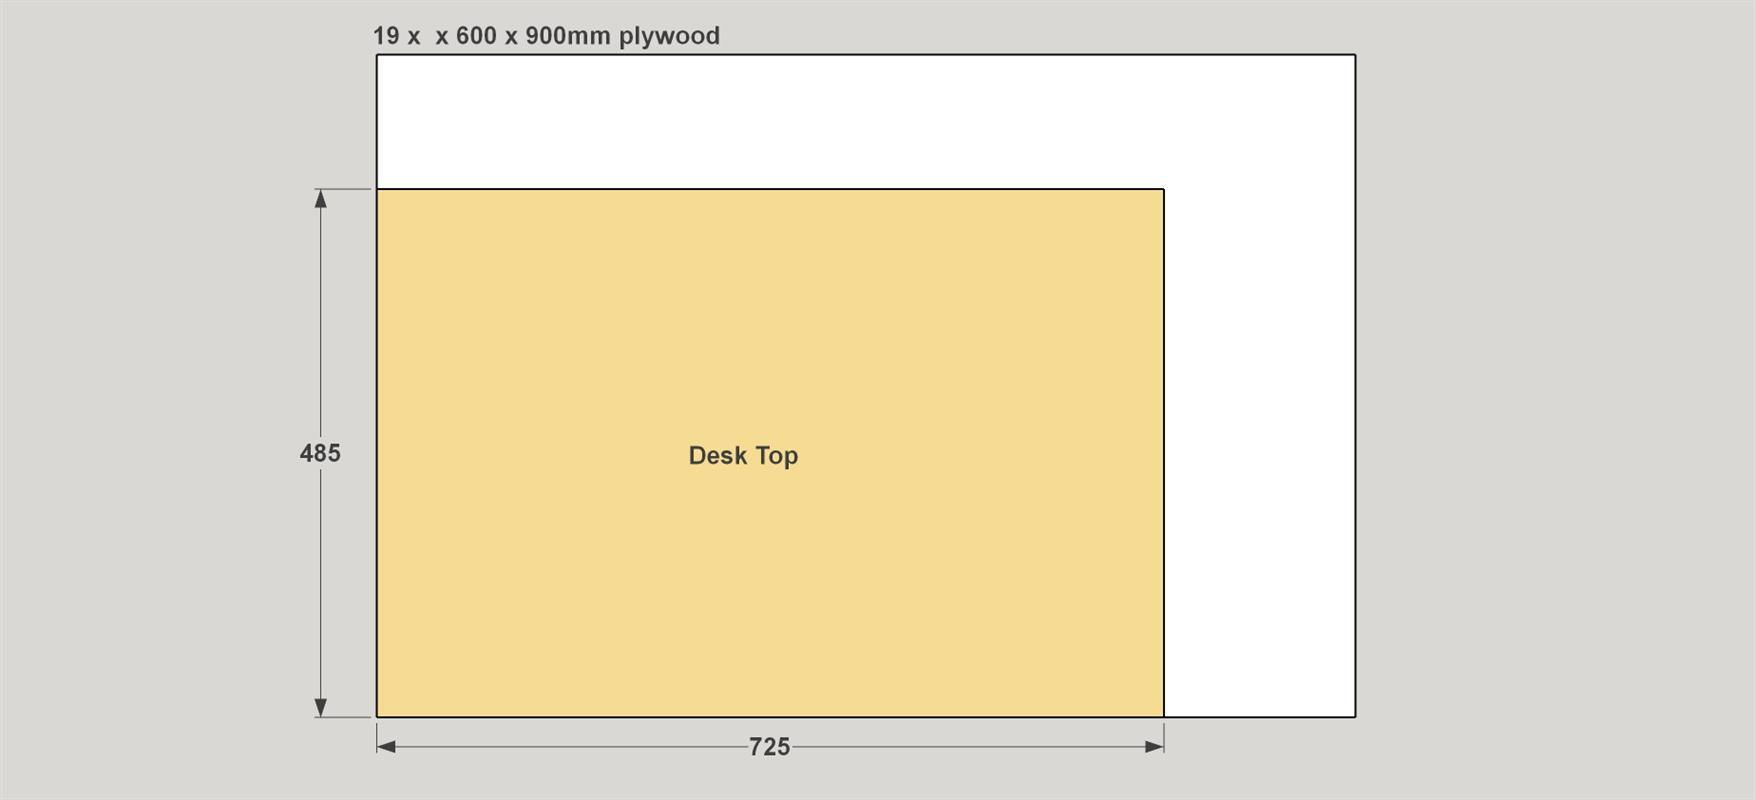 cut-diagram-ply-6